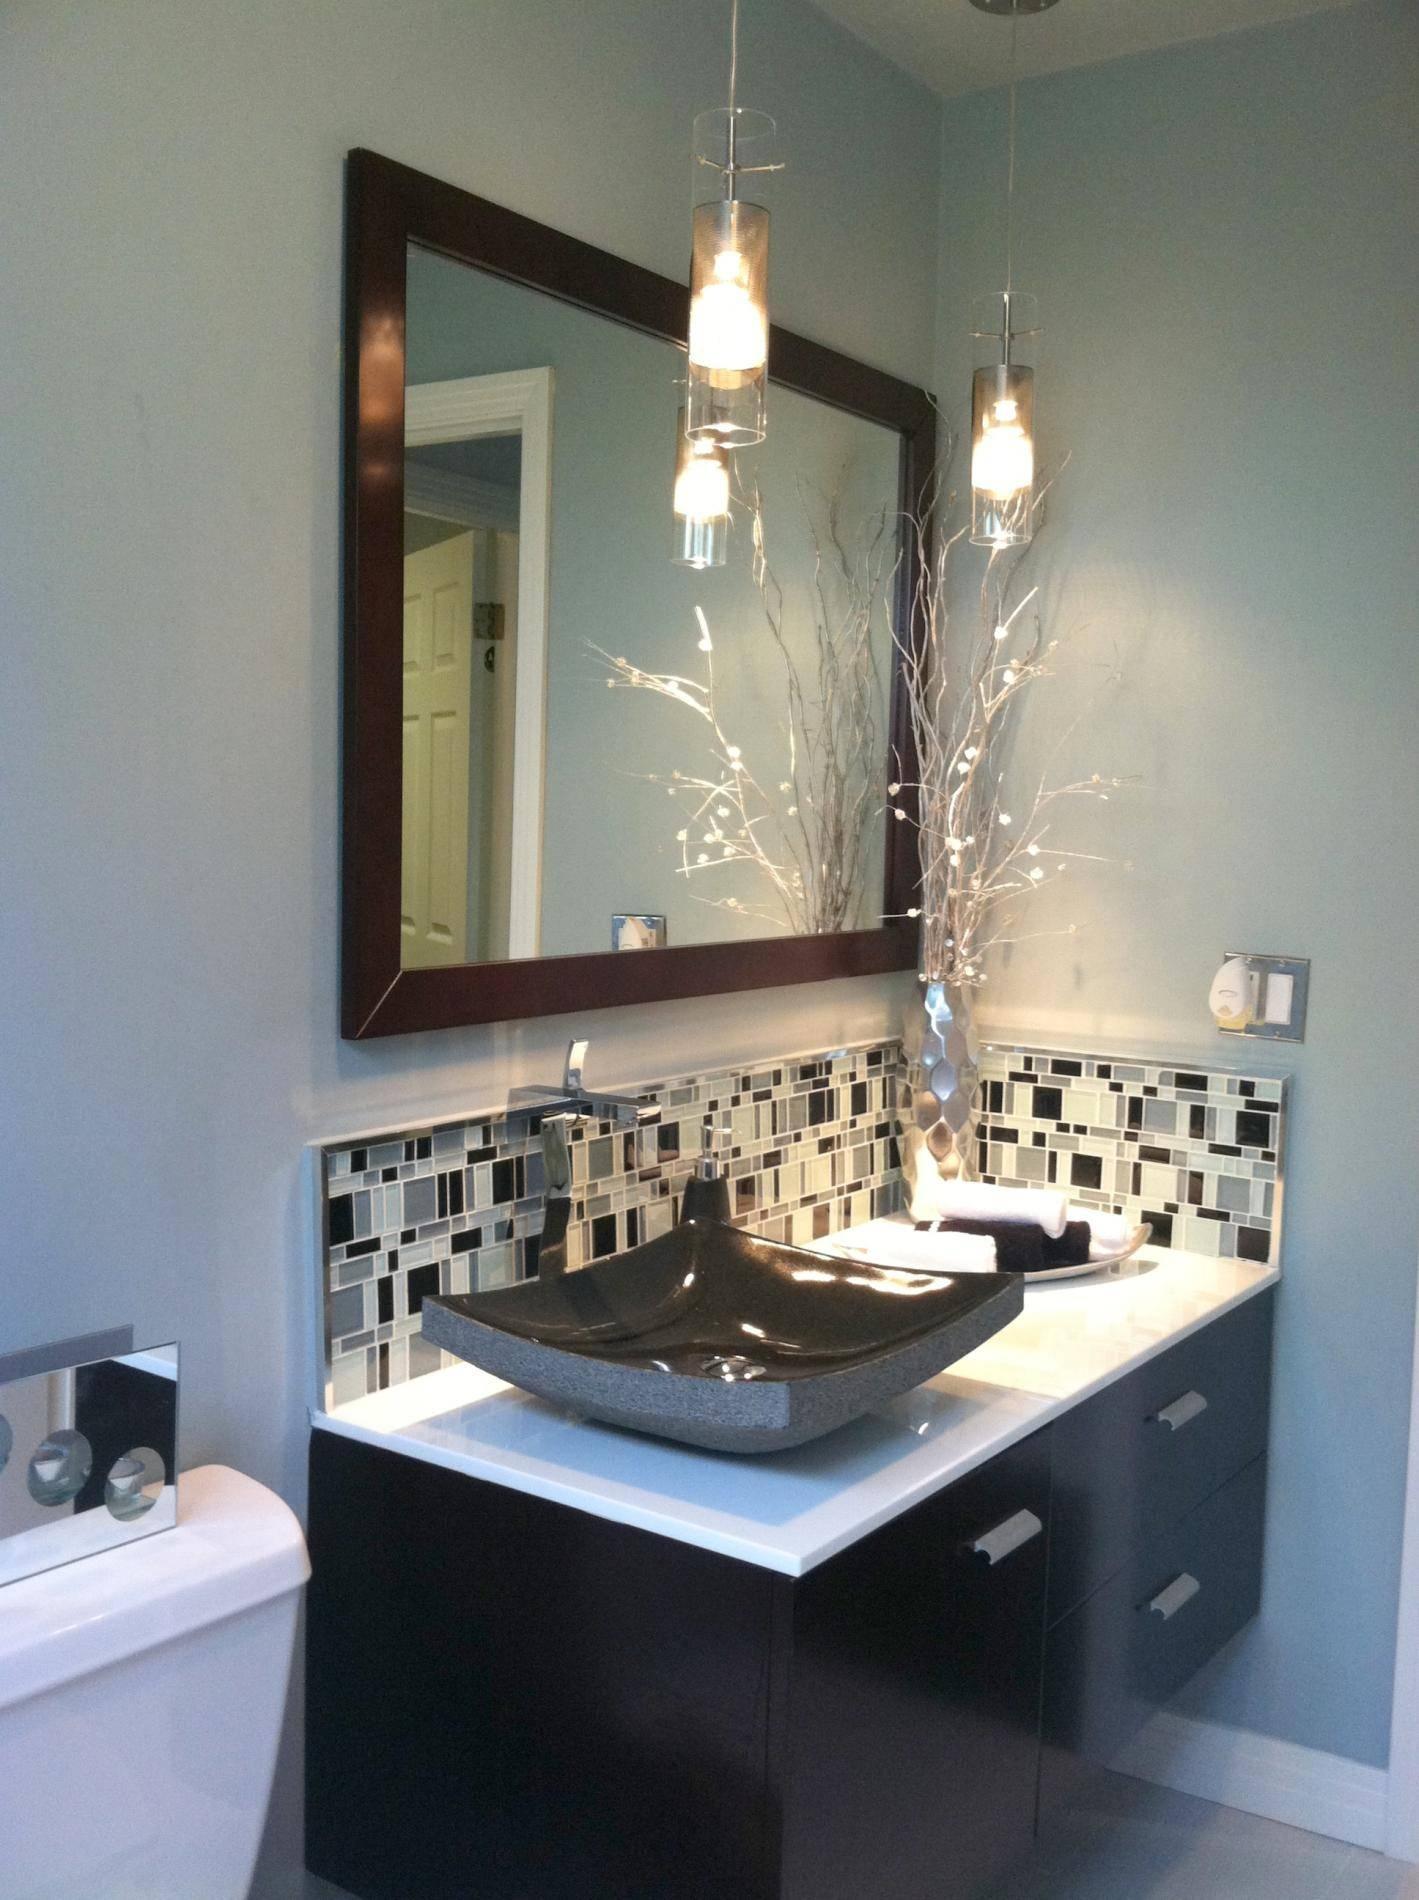 Bathroom Pendant Lighting Fixtures With A Controllable Light regarding Mini Pendant Lights For Bathroom (Image 7 of 15)